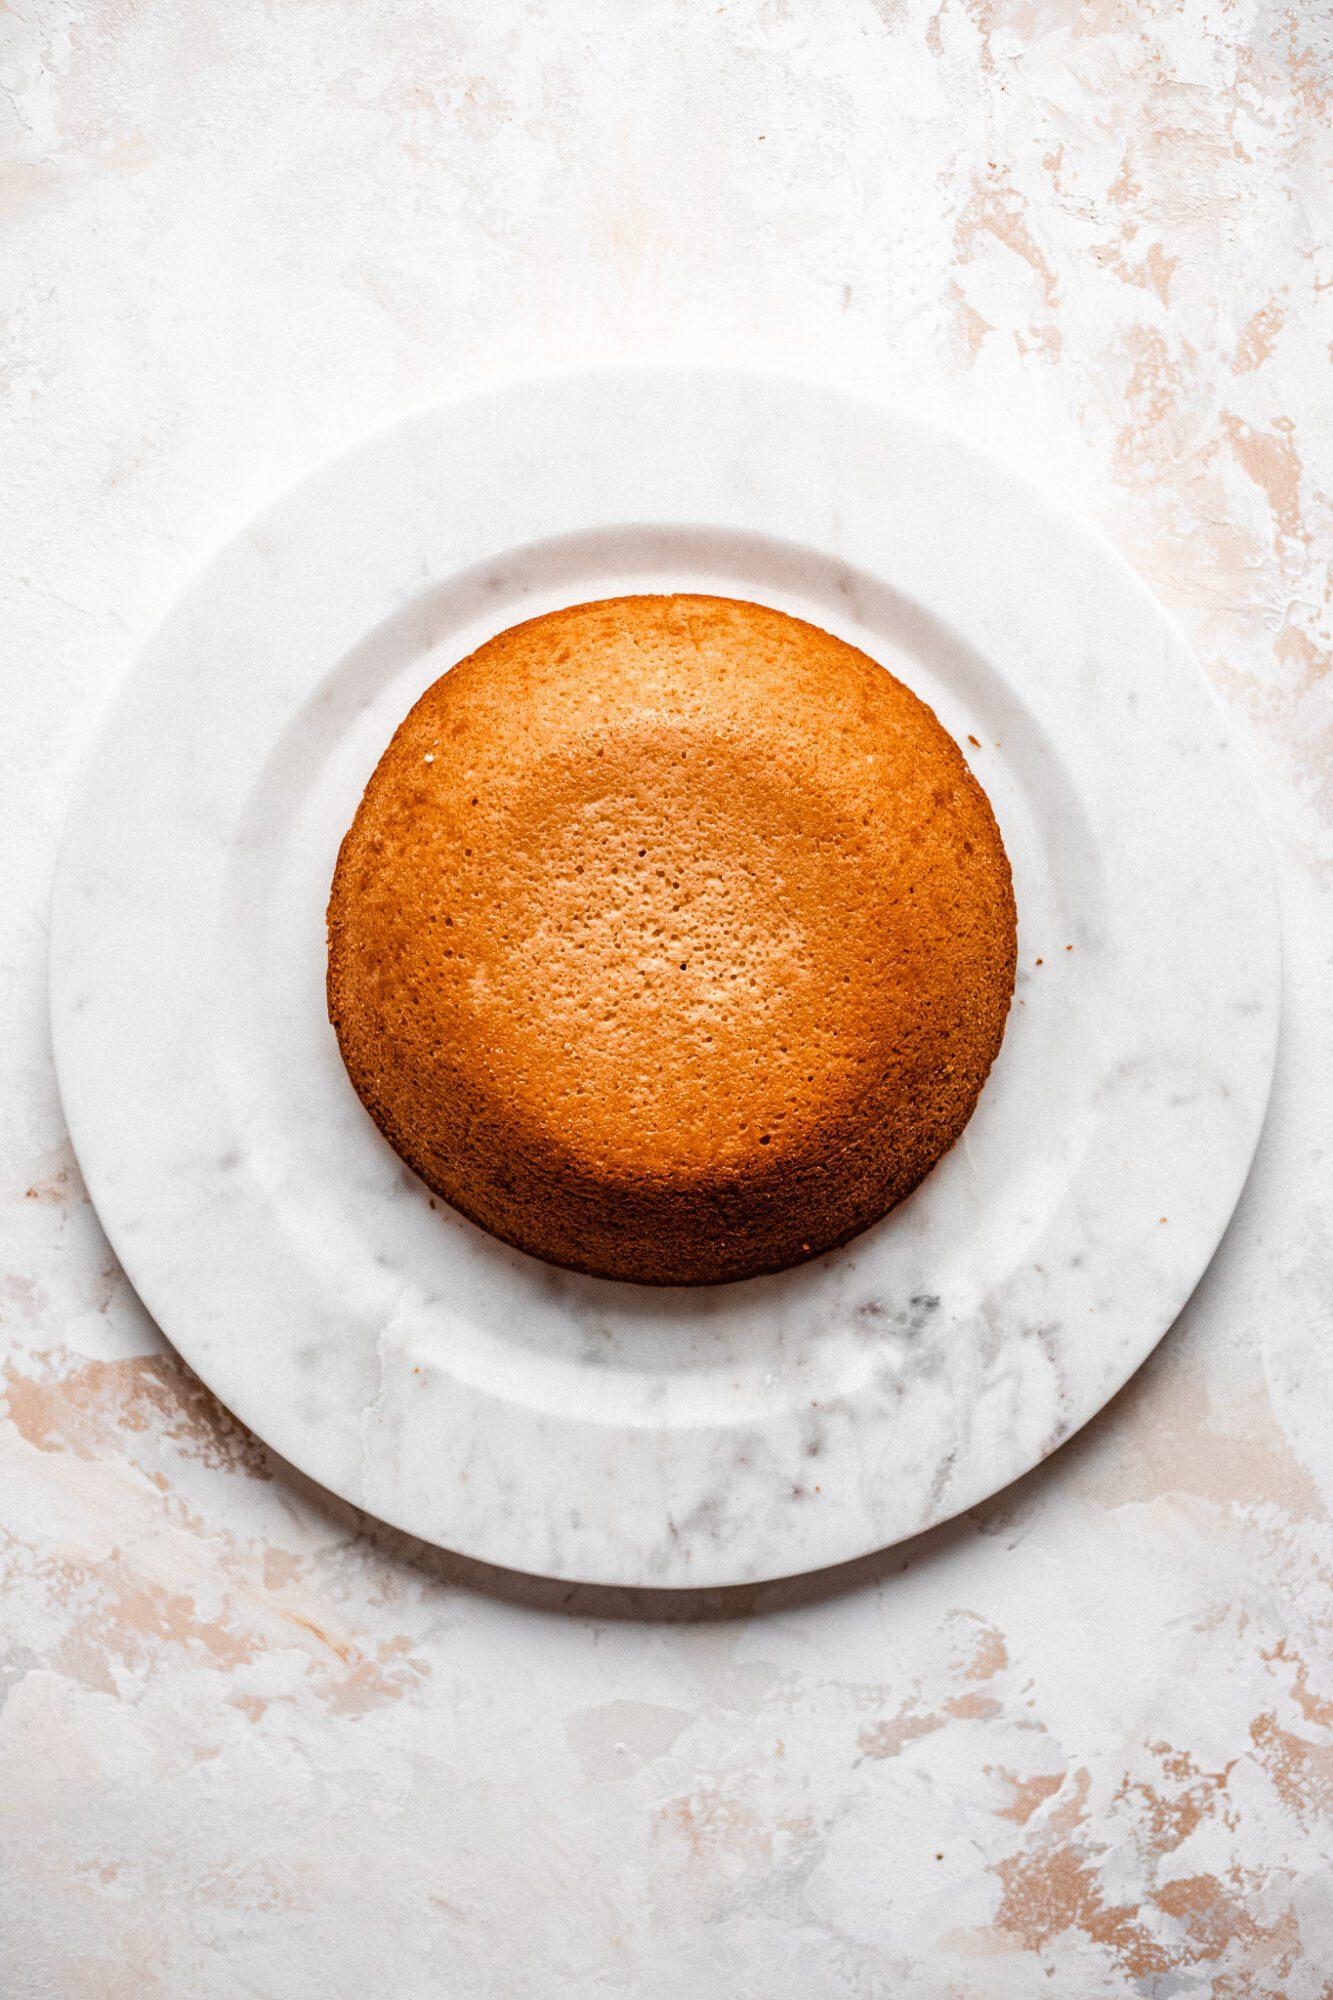 vegan vanilla cake on a plate